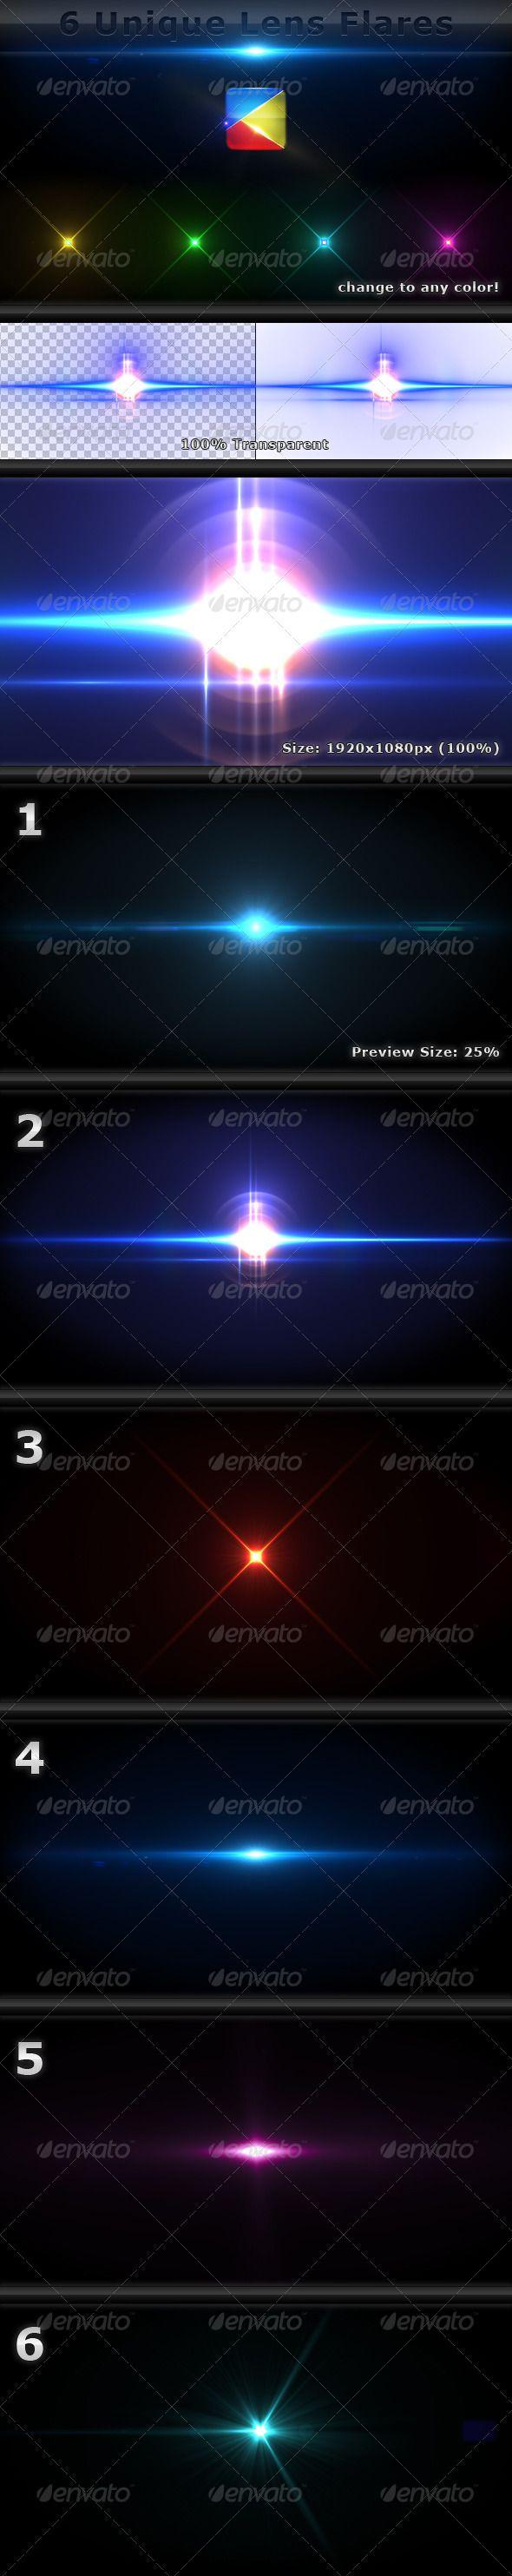 6 Unique Lens Flares - Light Effects -4- - #Decorative #Graphics Download here: https://graphicriver.net/item/6-unique-lens-flares-light-effects-4/1944343?ref=alena994